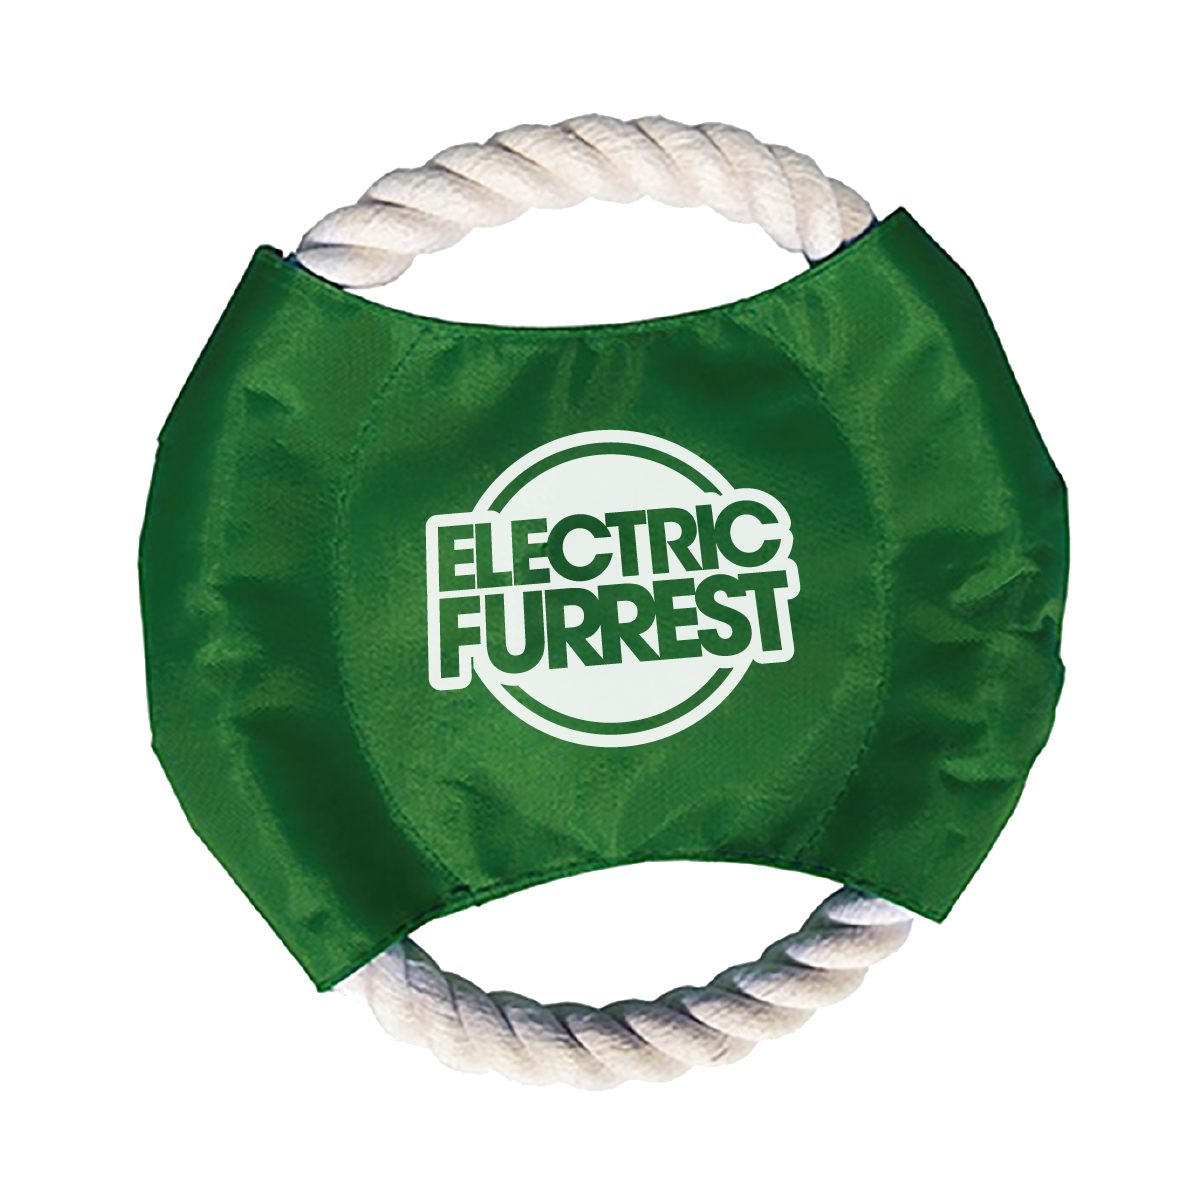 Electric Furrest Dog Rope Frisbee